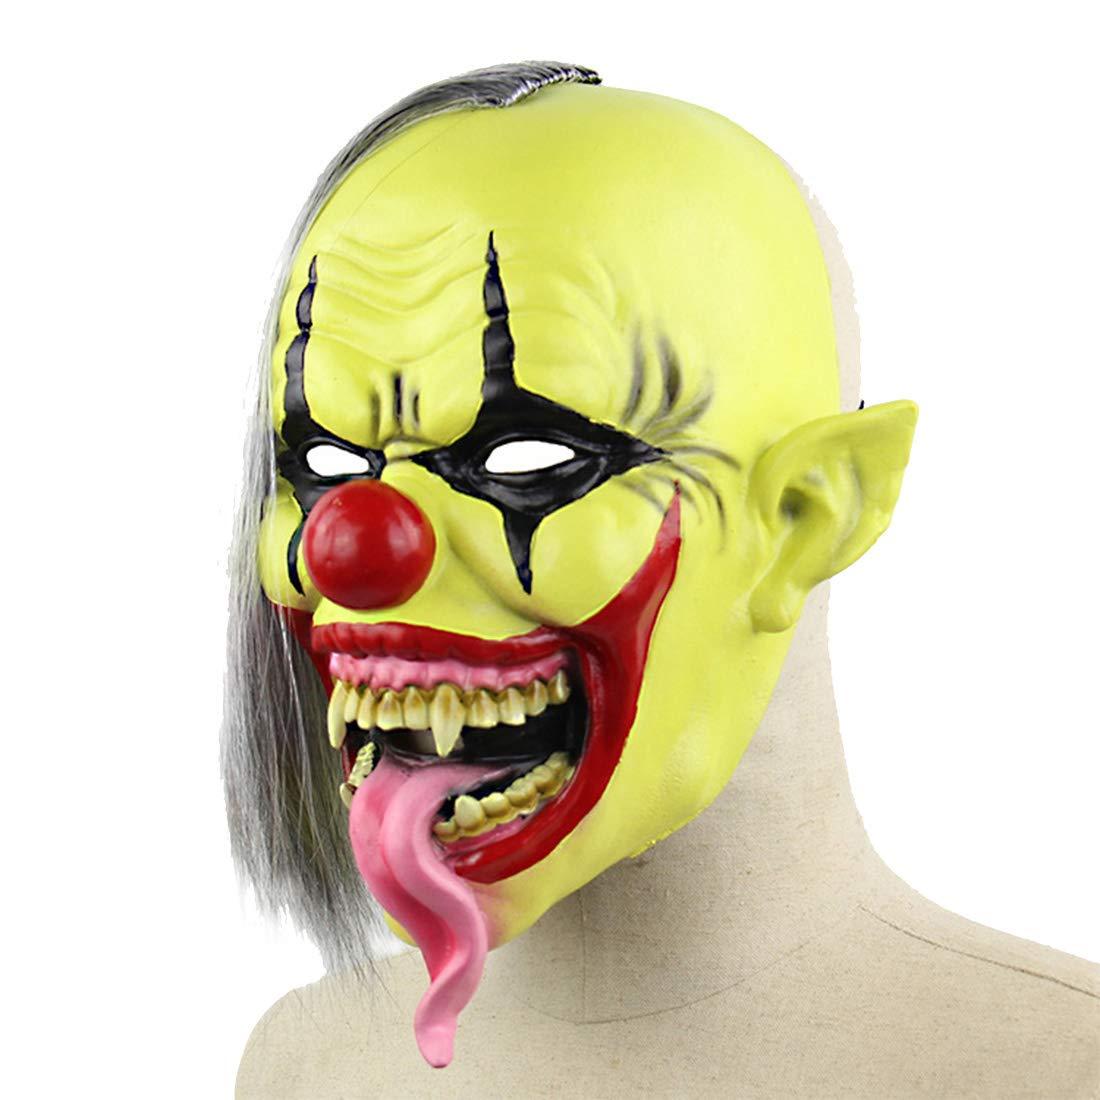 Mens Horror Green Face Clown Mask Halloween Cosplay Costume Latex Masks Party Masquerade Grotesque Props